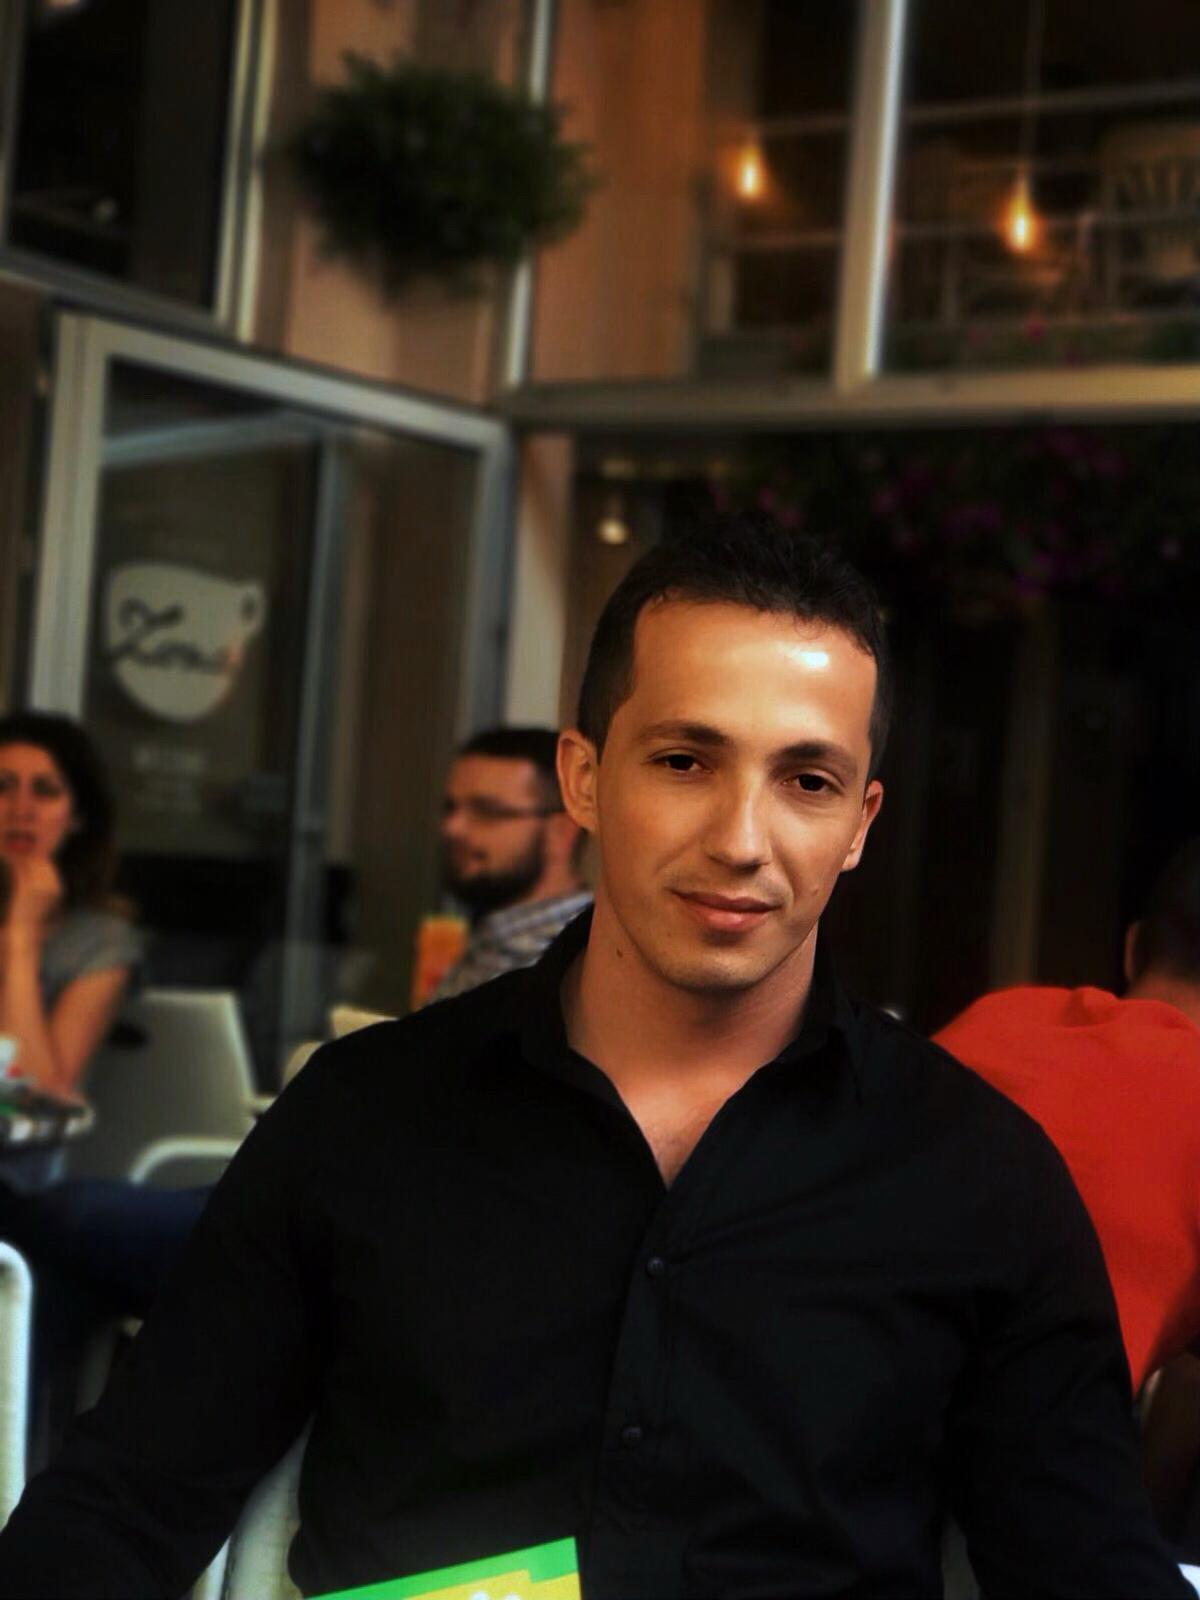 Edin Hambelić